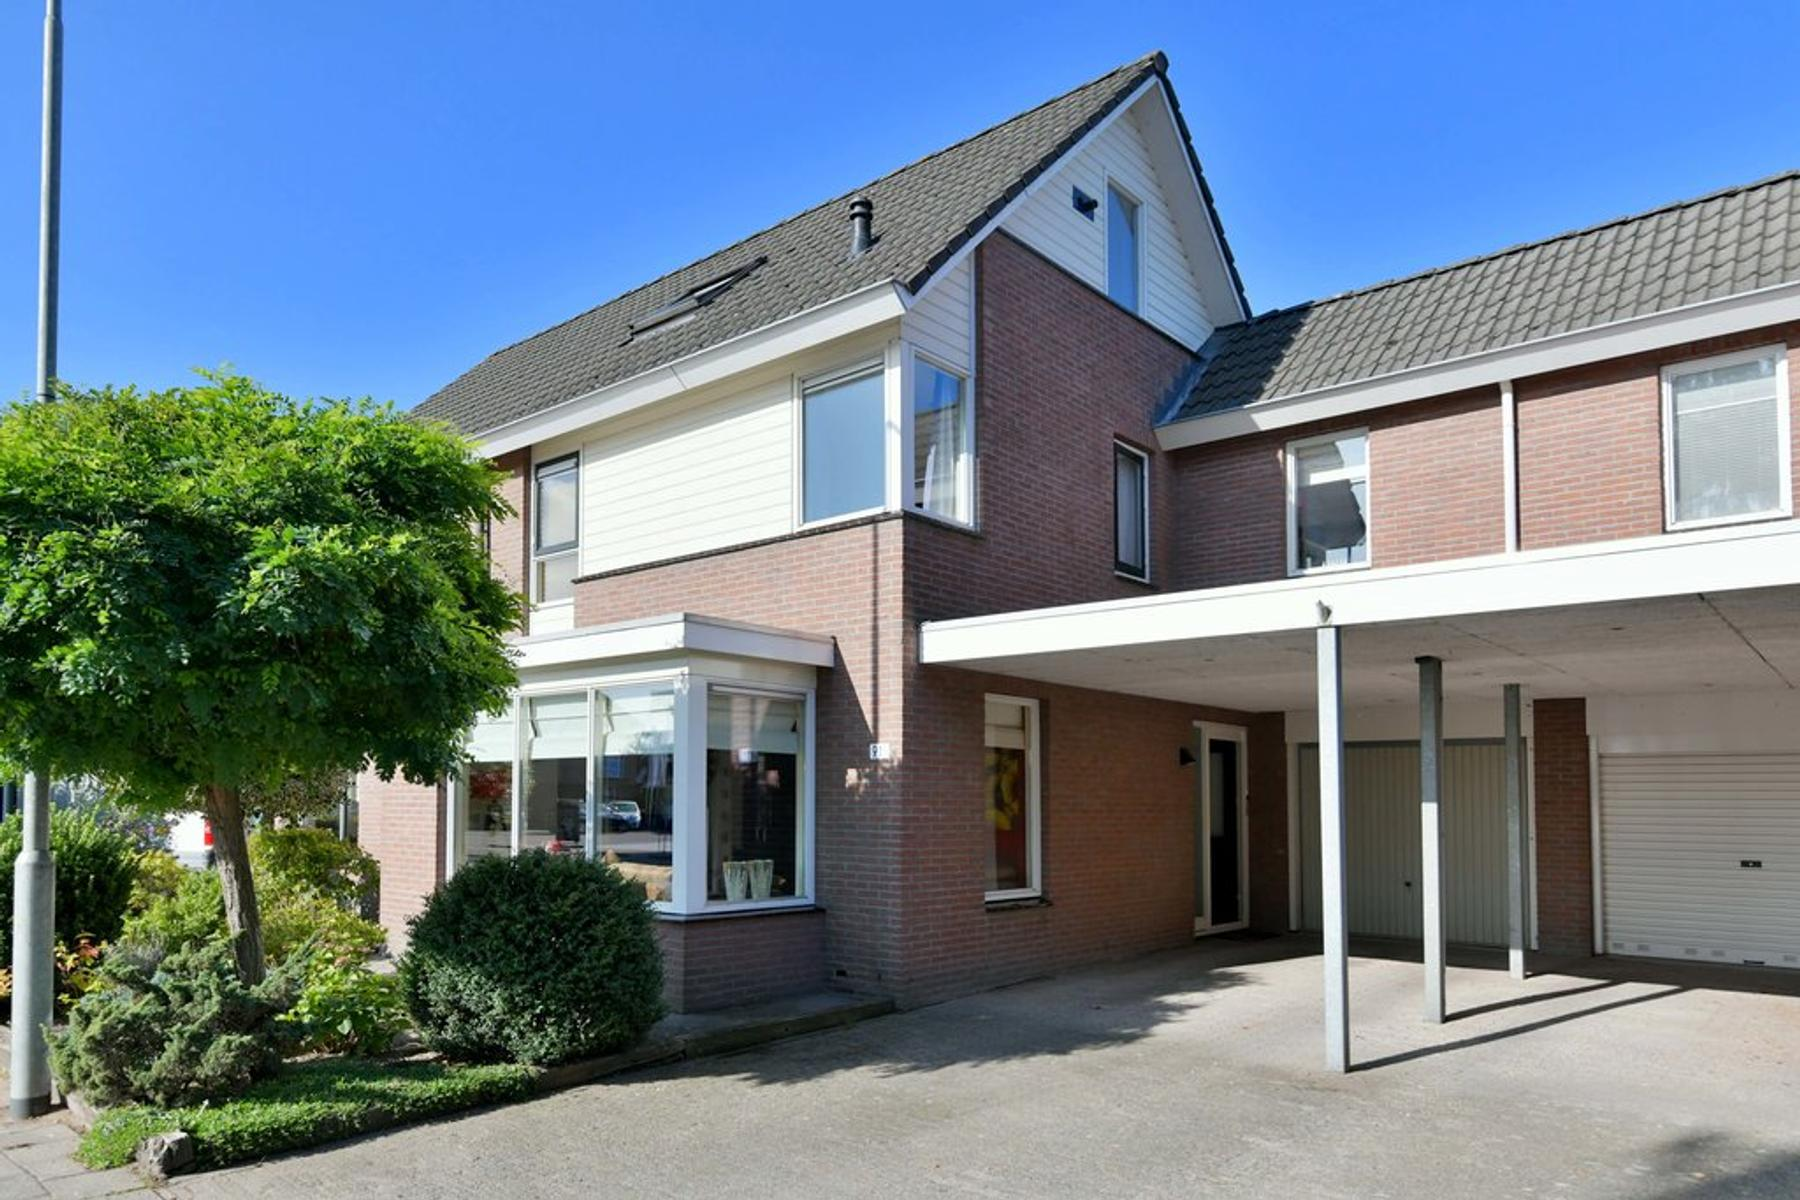 Zutphensestraat 91 A in Brummen 6971 EJ